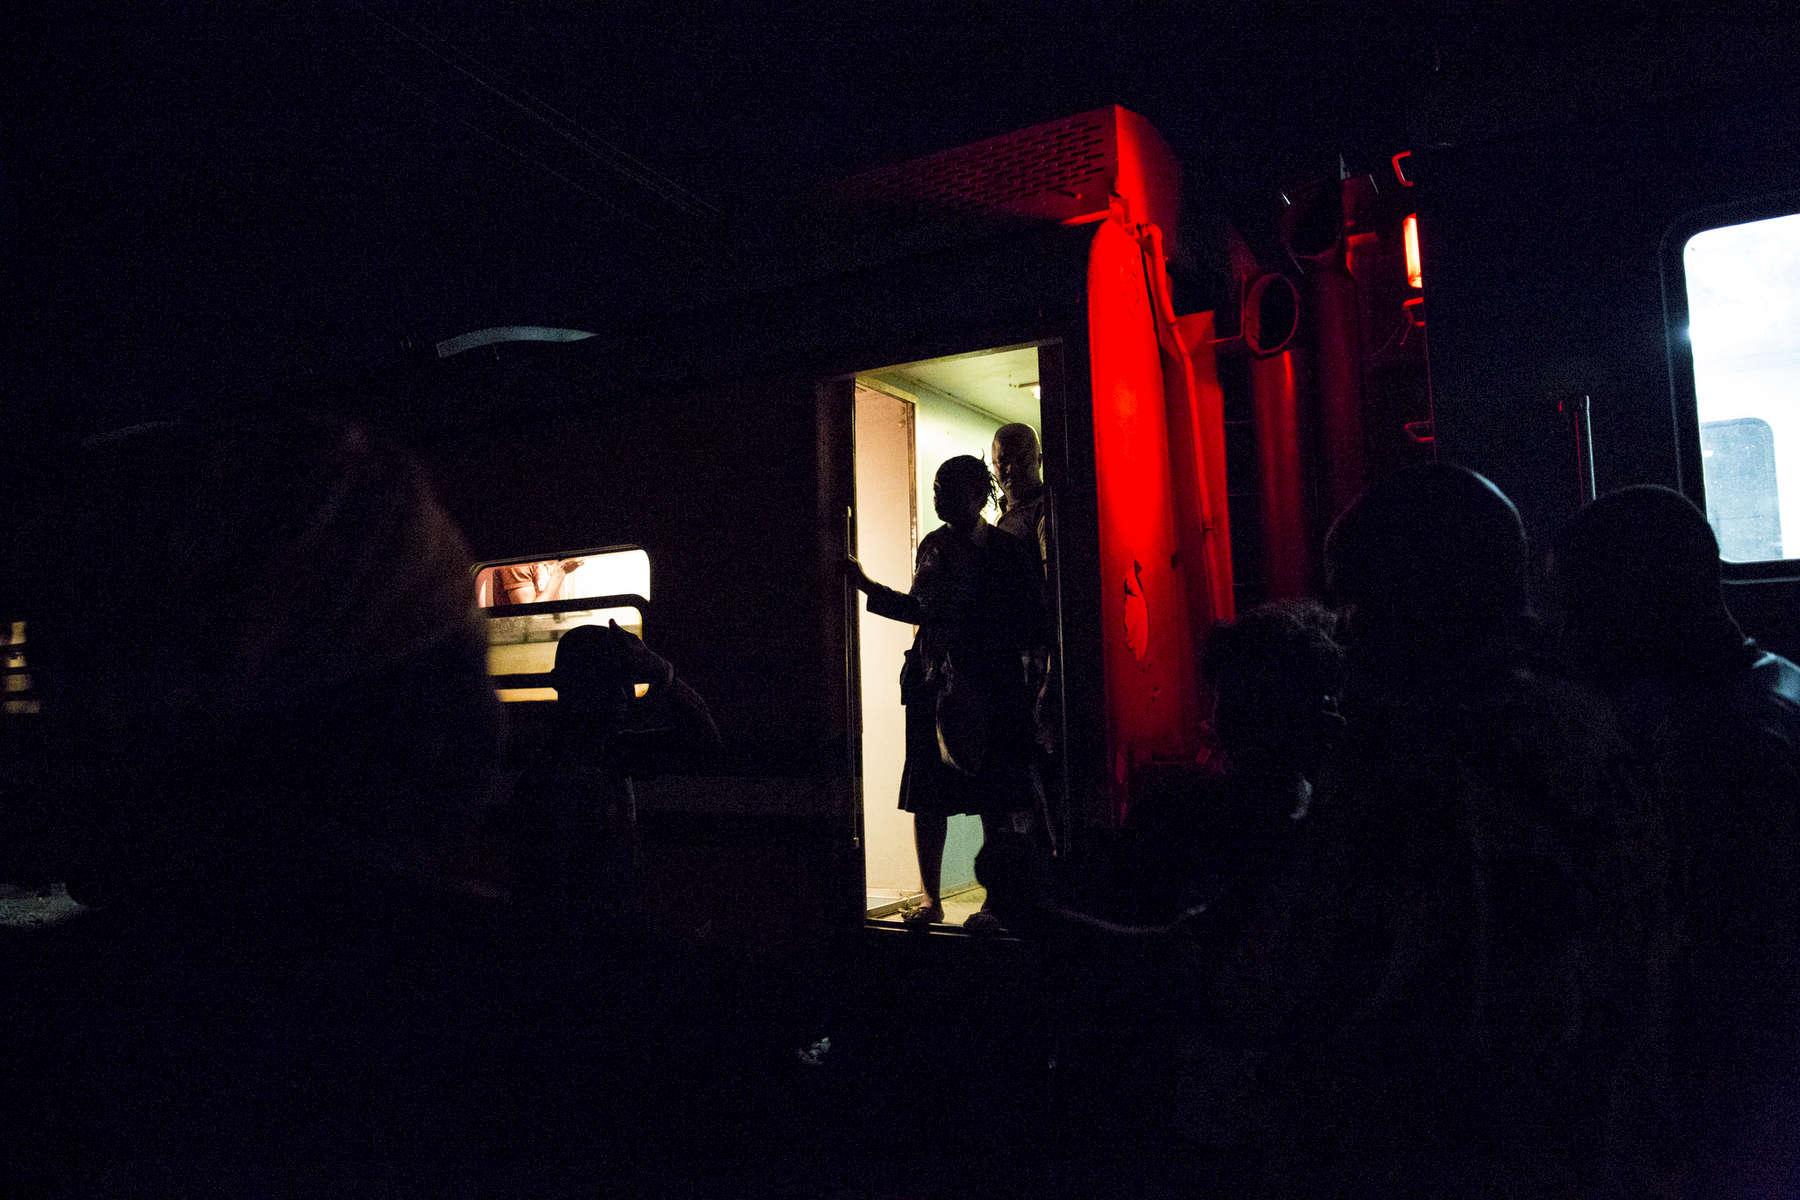 The train stops at Kaduna, the biggest city before Kano, just past dark.